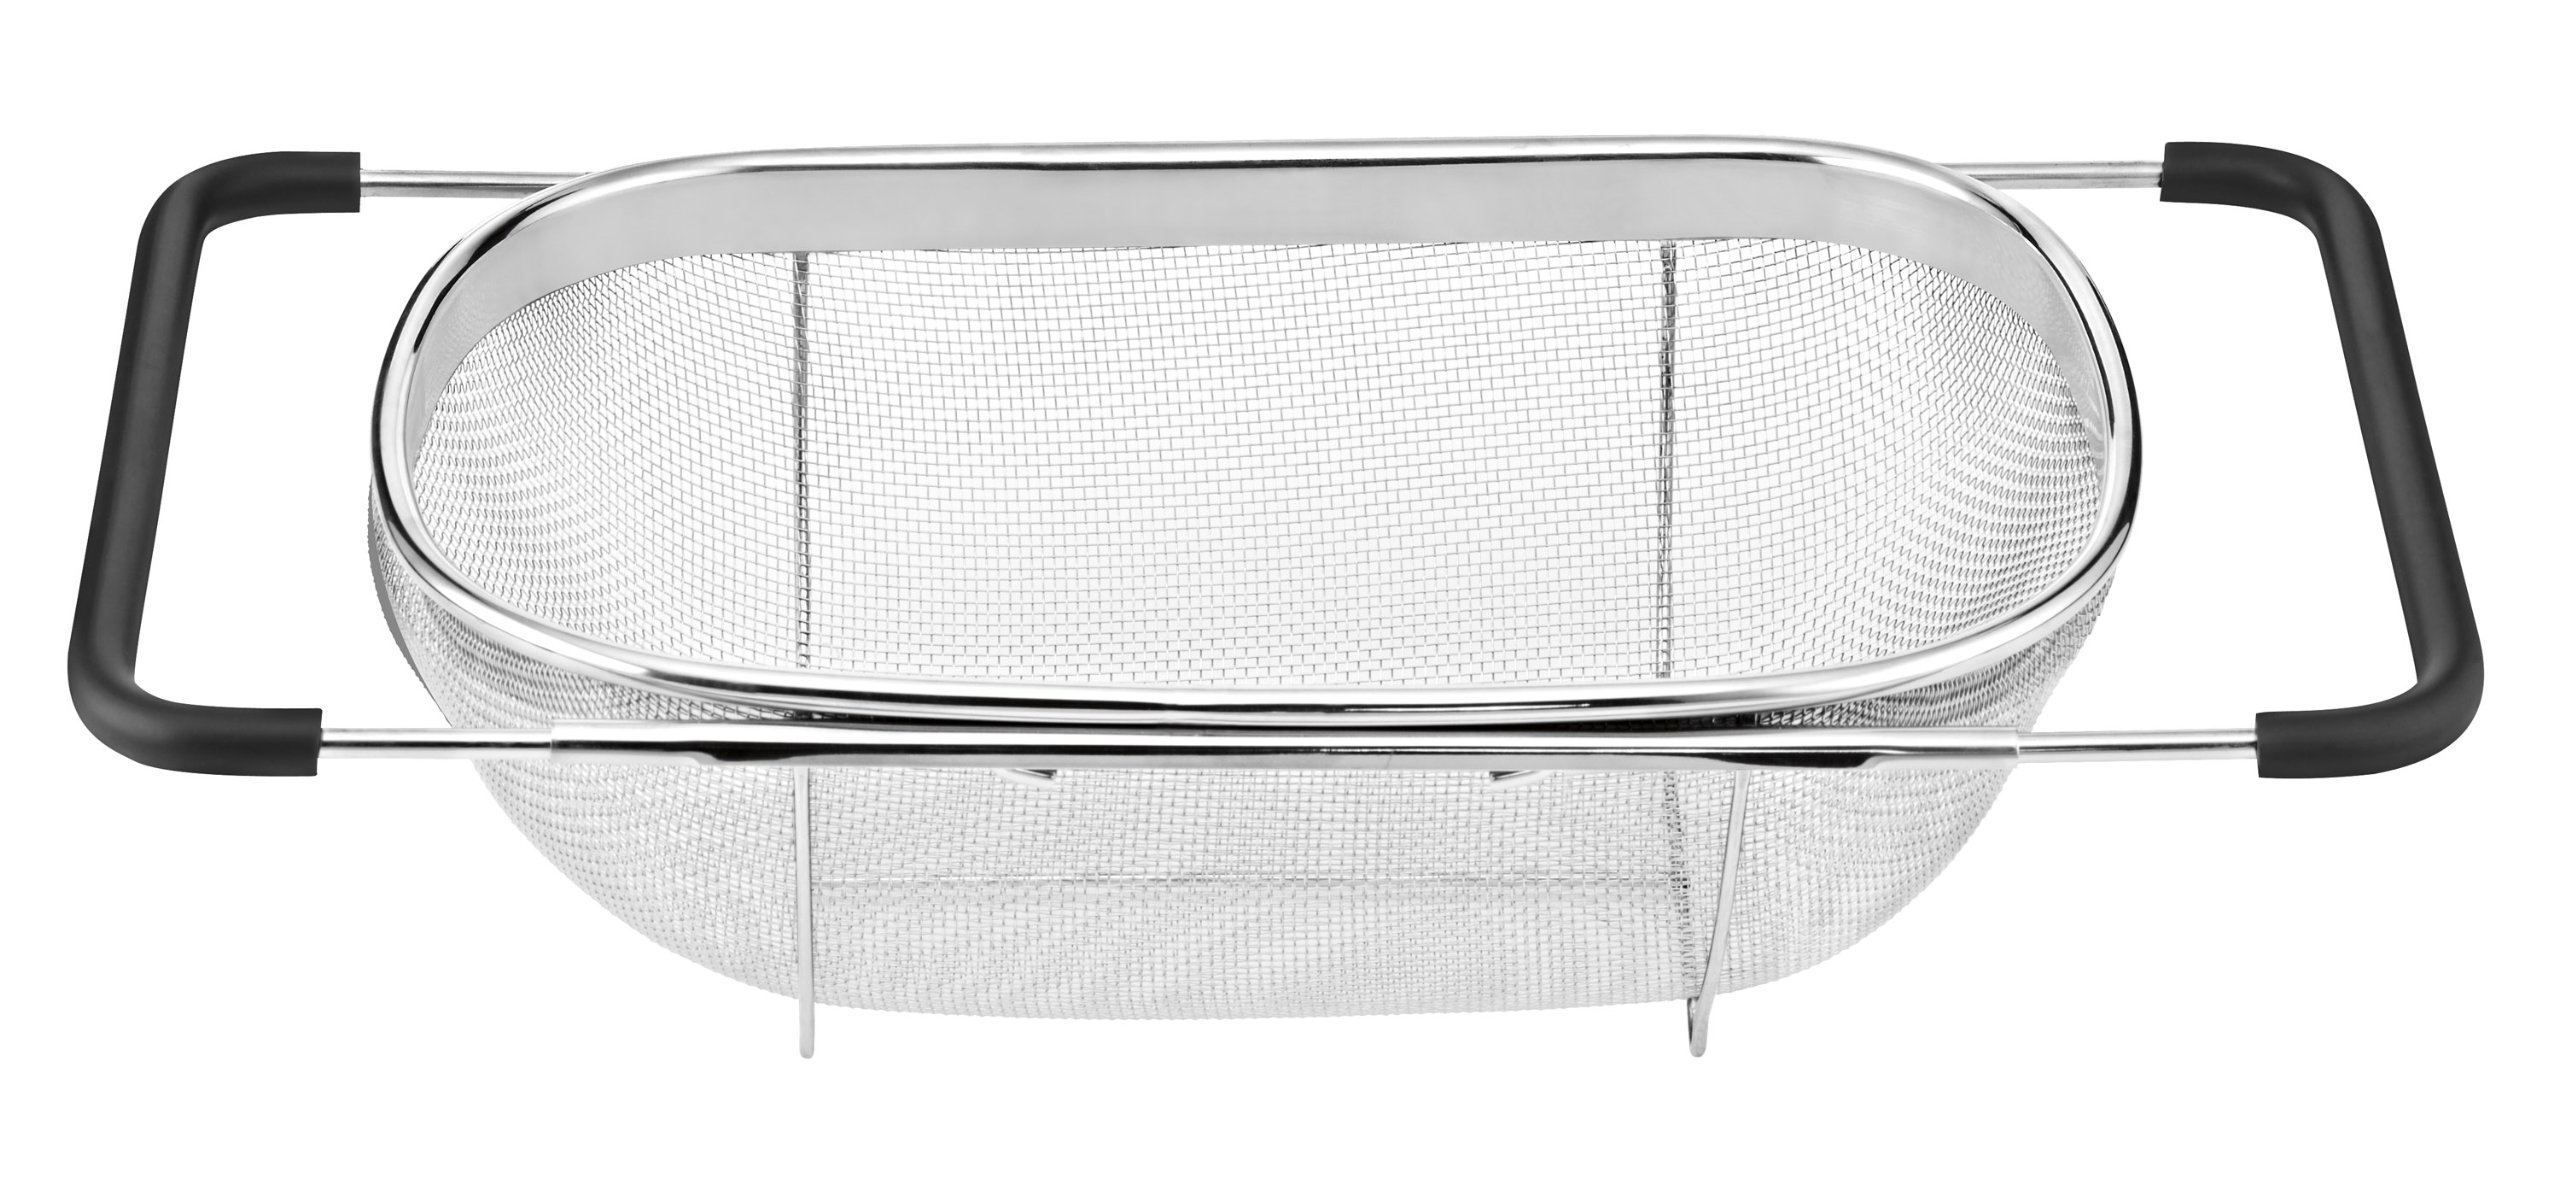 Cuisinart CTG-00-OSC Over-The-Sink Colander, 5.5 Qt